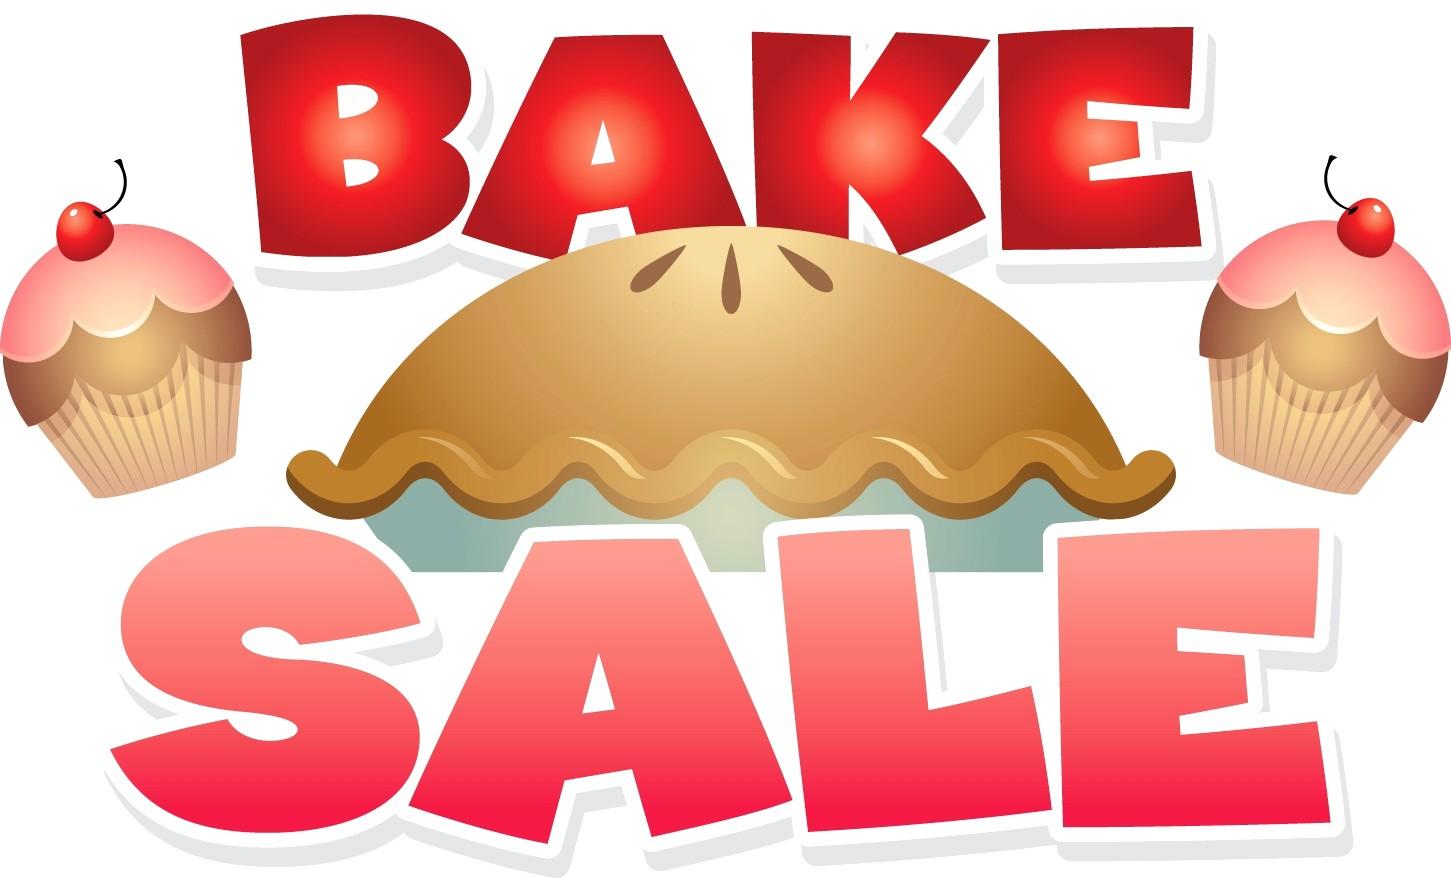 Bake sale clipart 4 » Clipart Station.